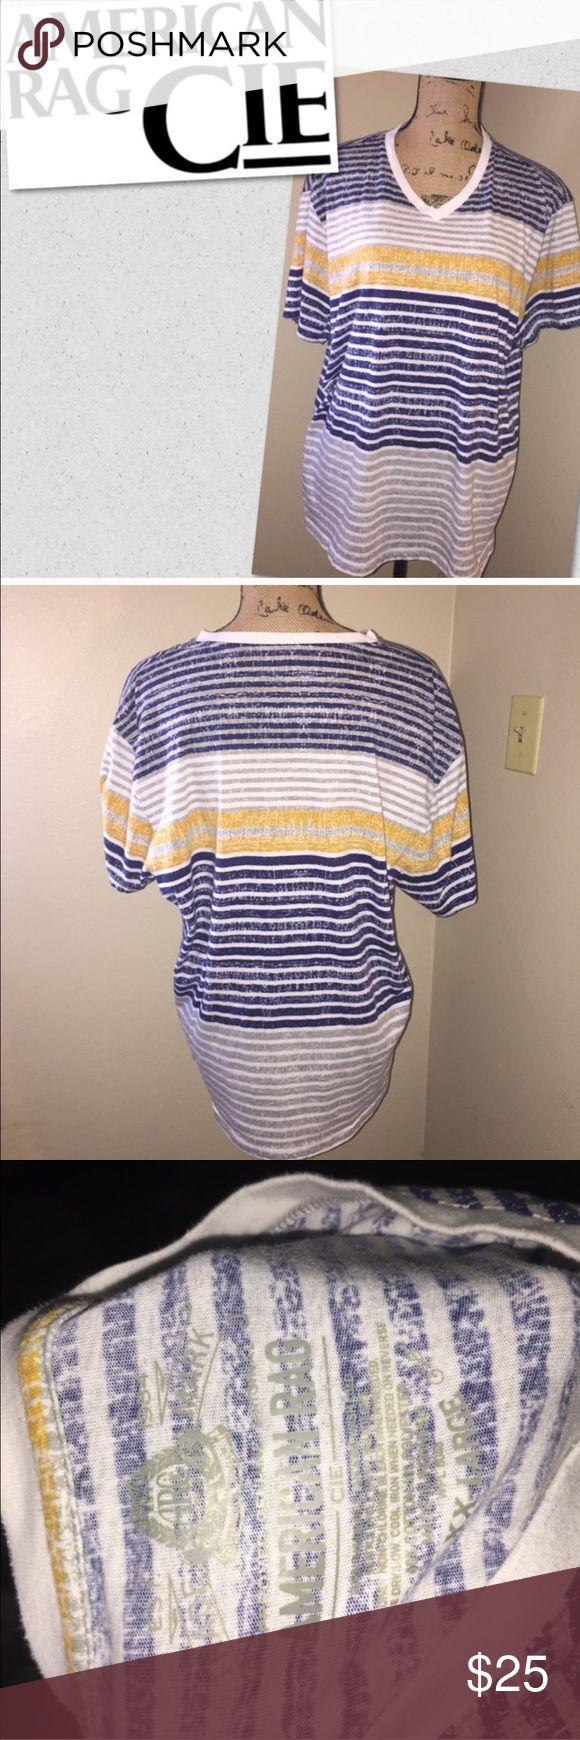 American rag cie t shirt strips size xxl American rag cie t shirt strips size xxl American Rag Tops Tees - Short Sleeve